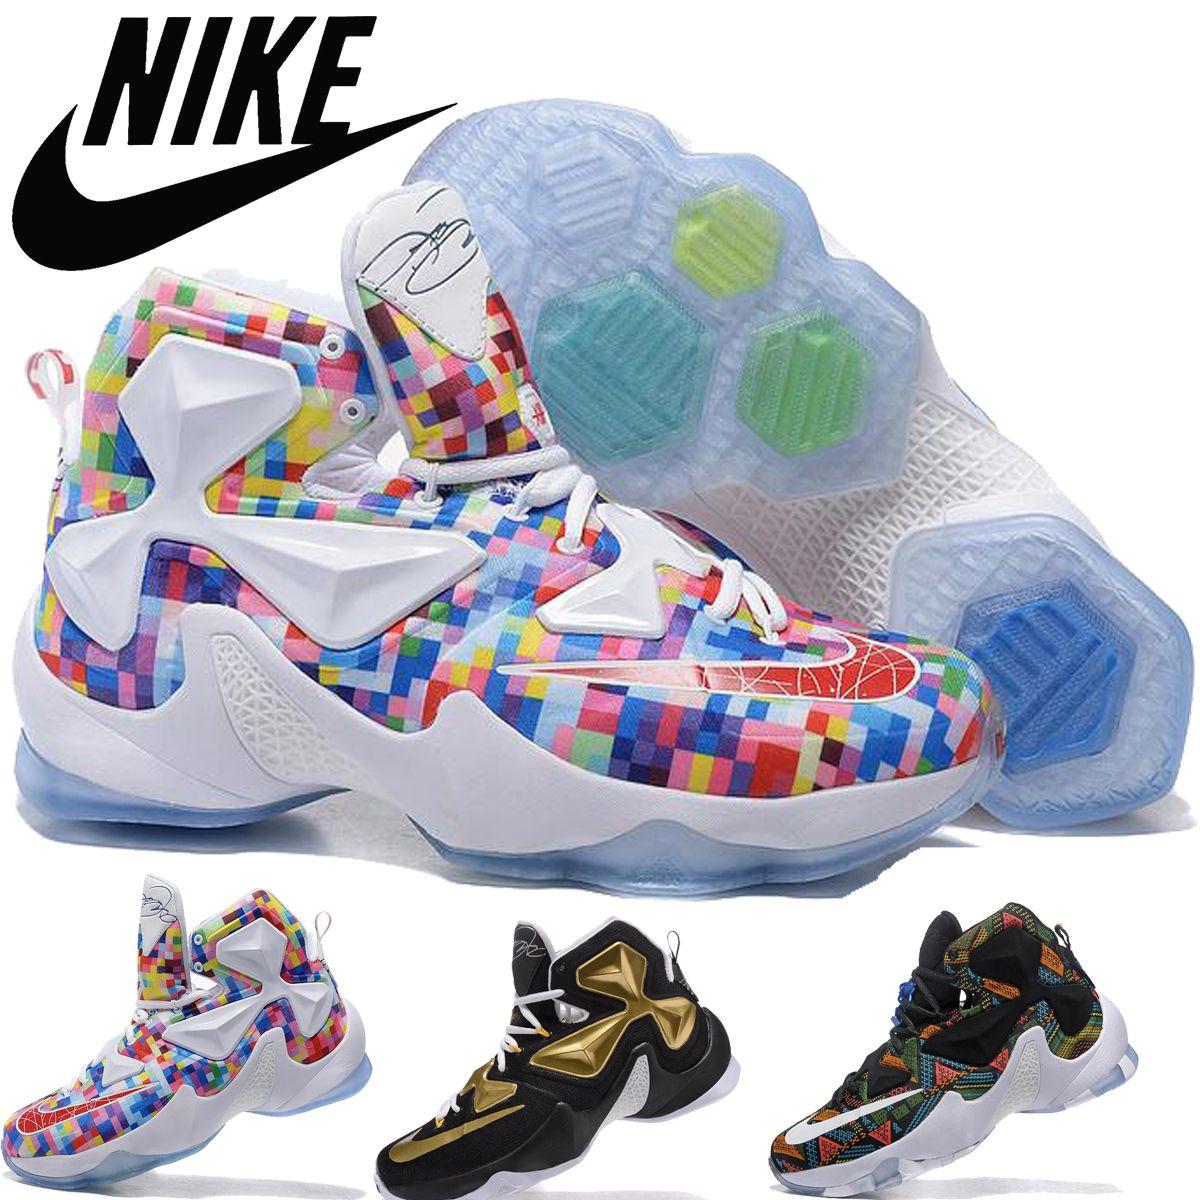 Nike Lebron 13 Xiii BHM Black History